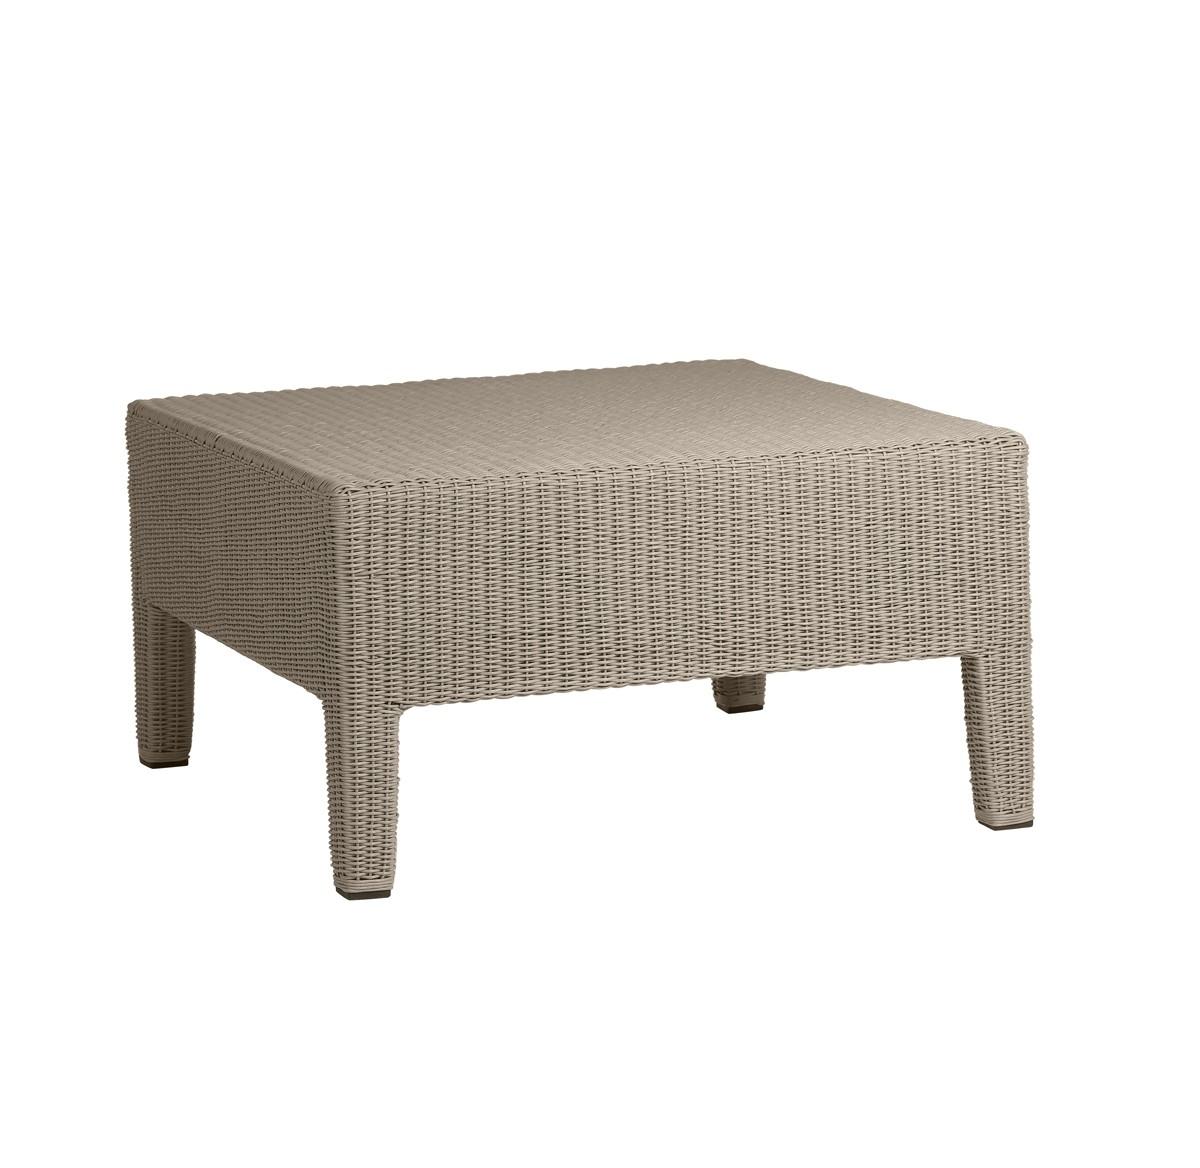 repose pieds terra de trib gris clair. Black Bedroom Furniture Sets. Home Design Ideas